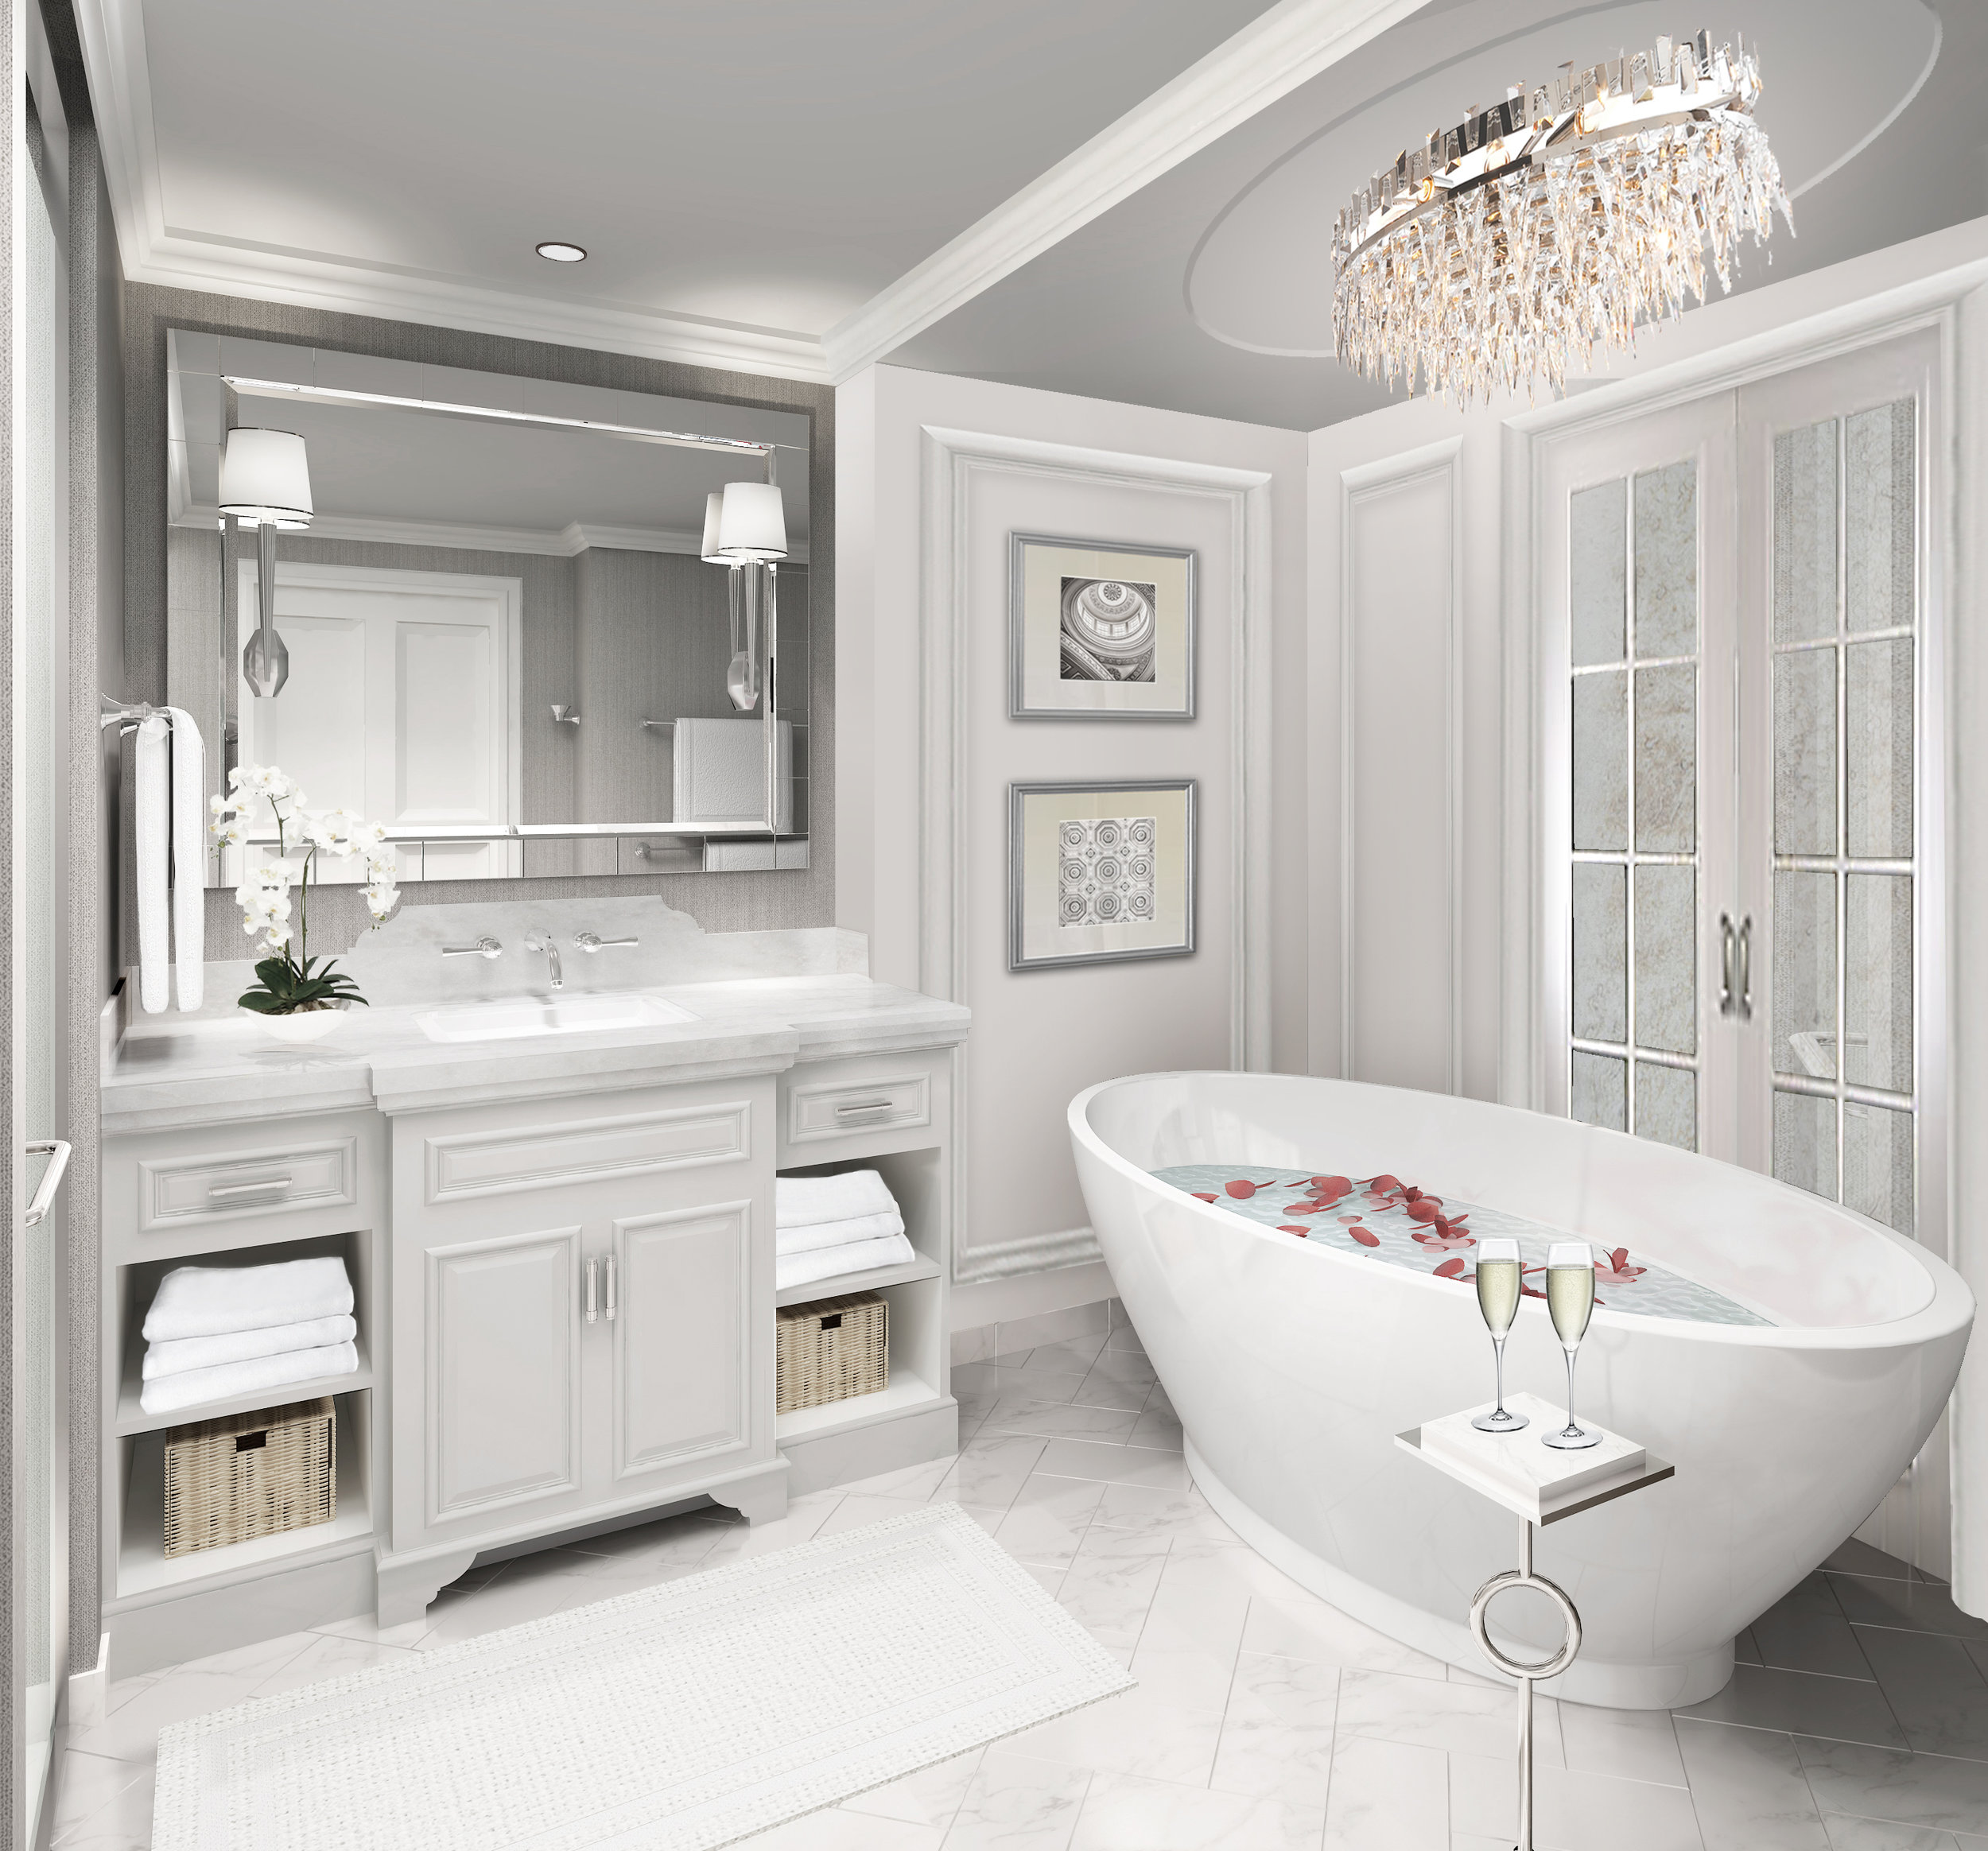 Model Room Bath Final - Opt3 Antique Mirror.jpg